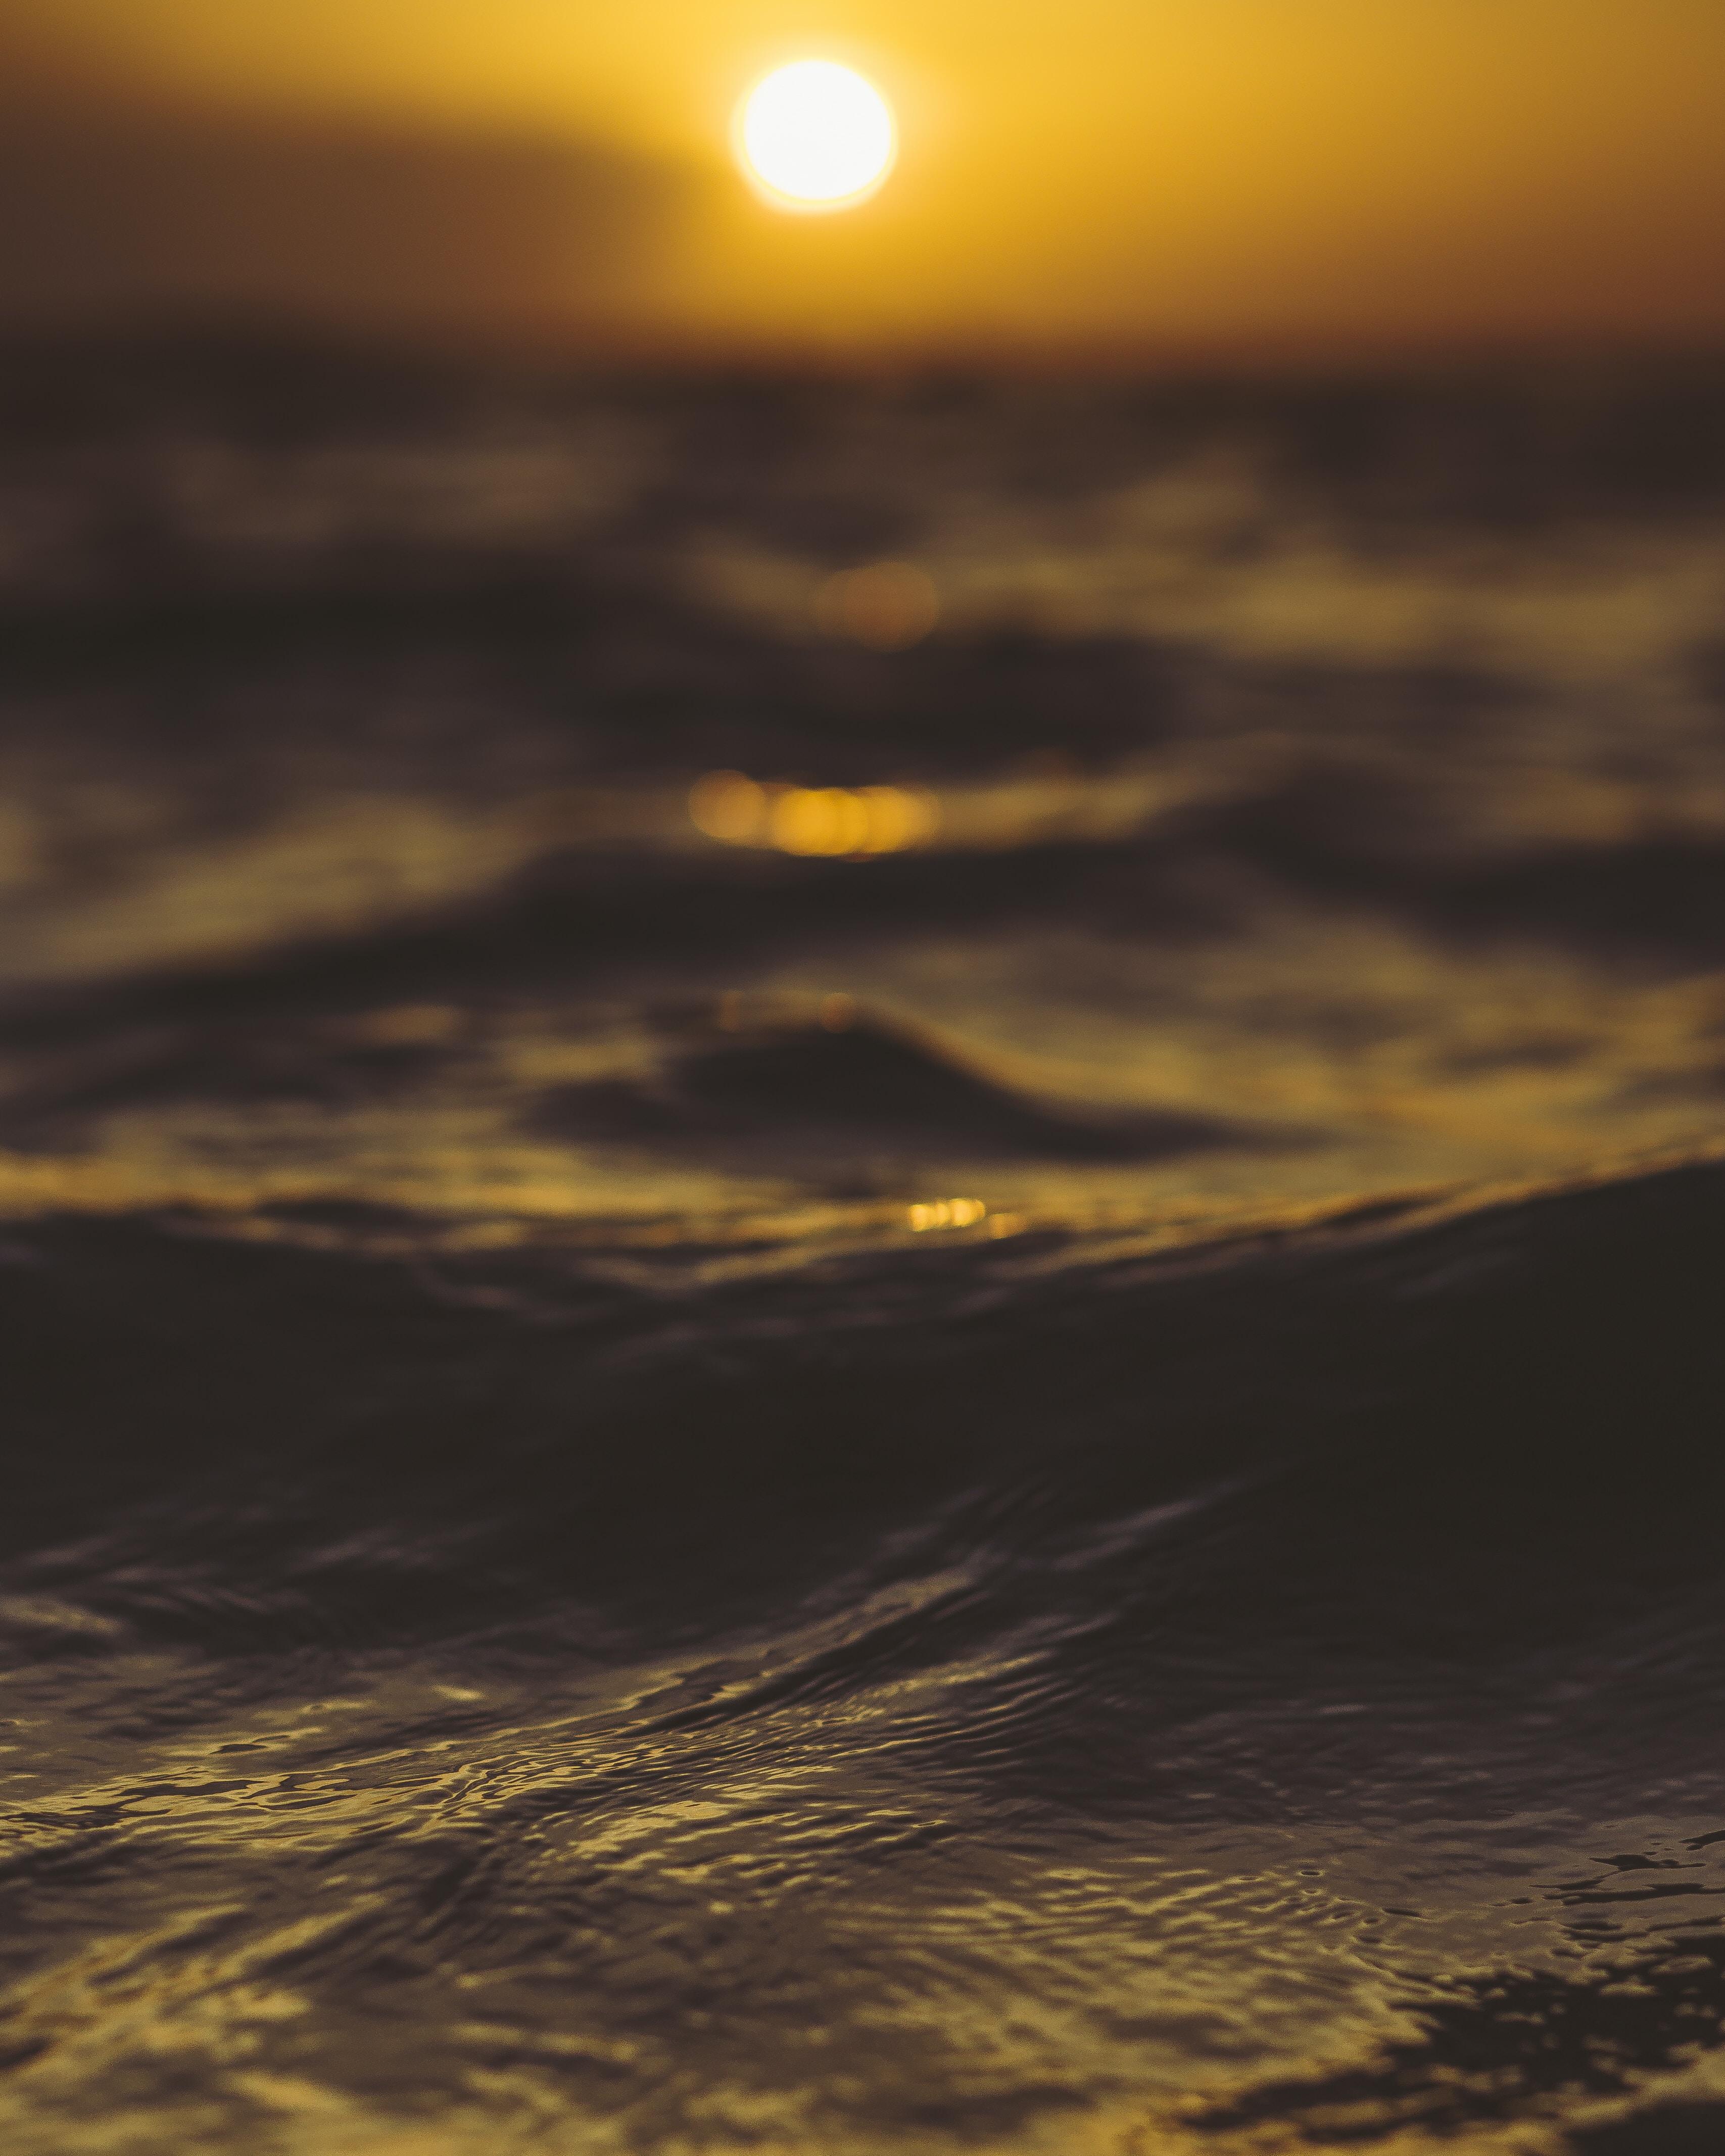 macro photography of body of water